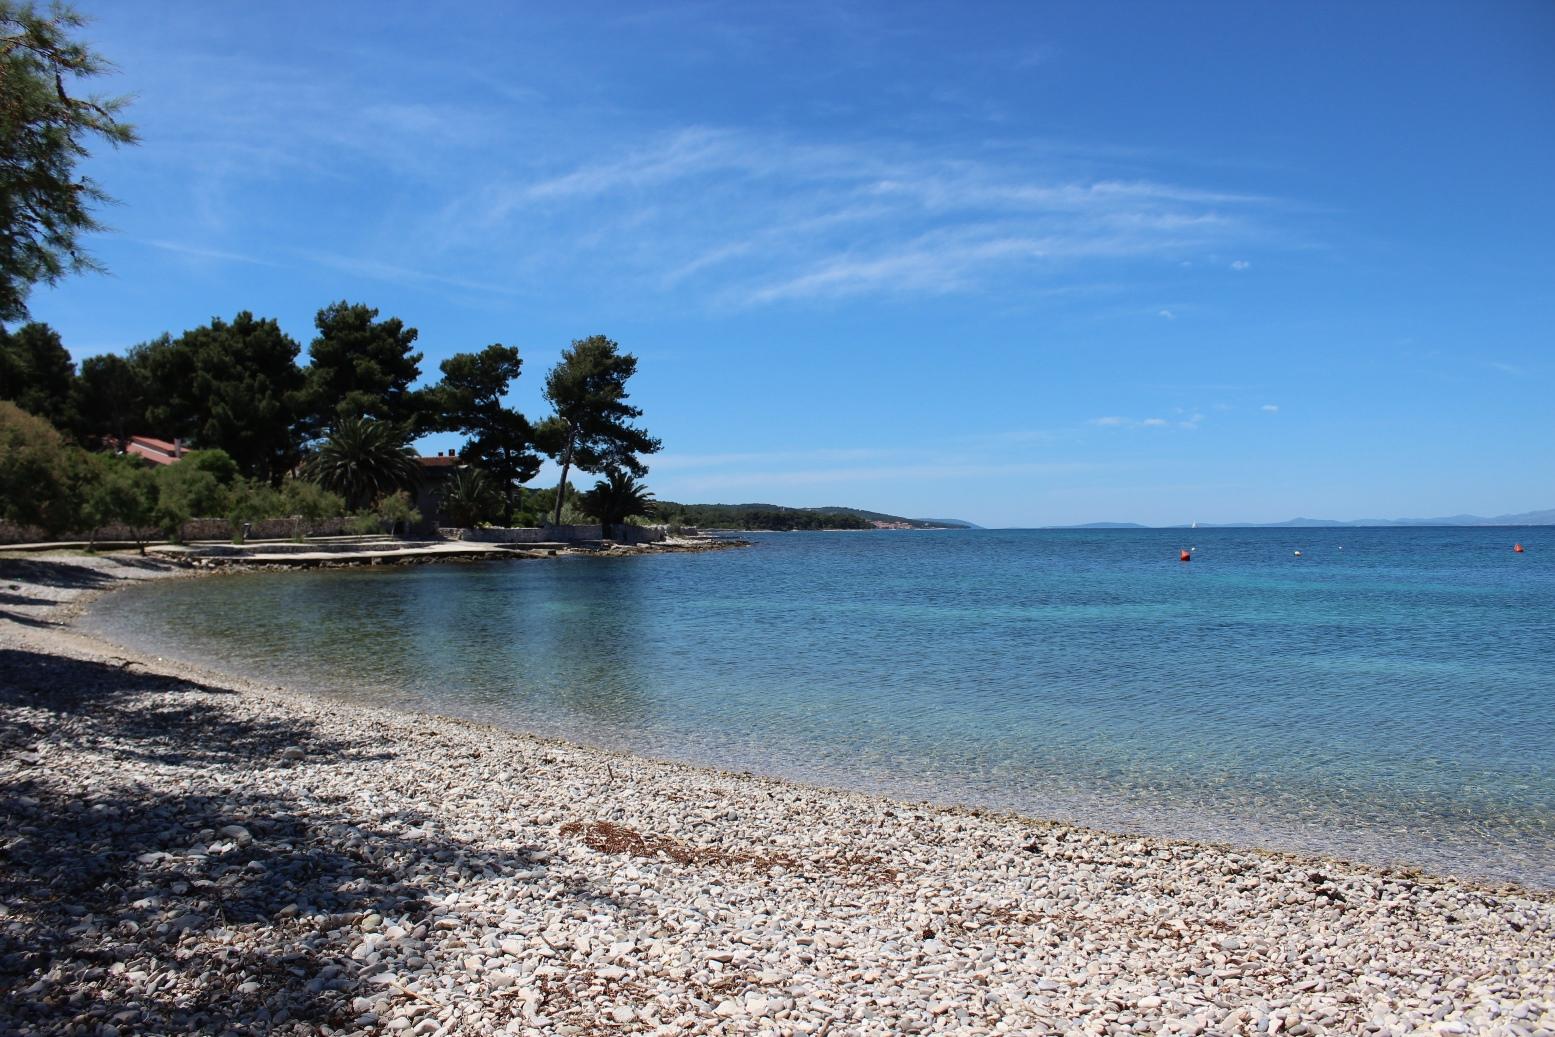 6018 - Mirca - Hiše za počitek, vile Hrvaška - plaža